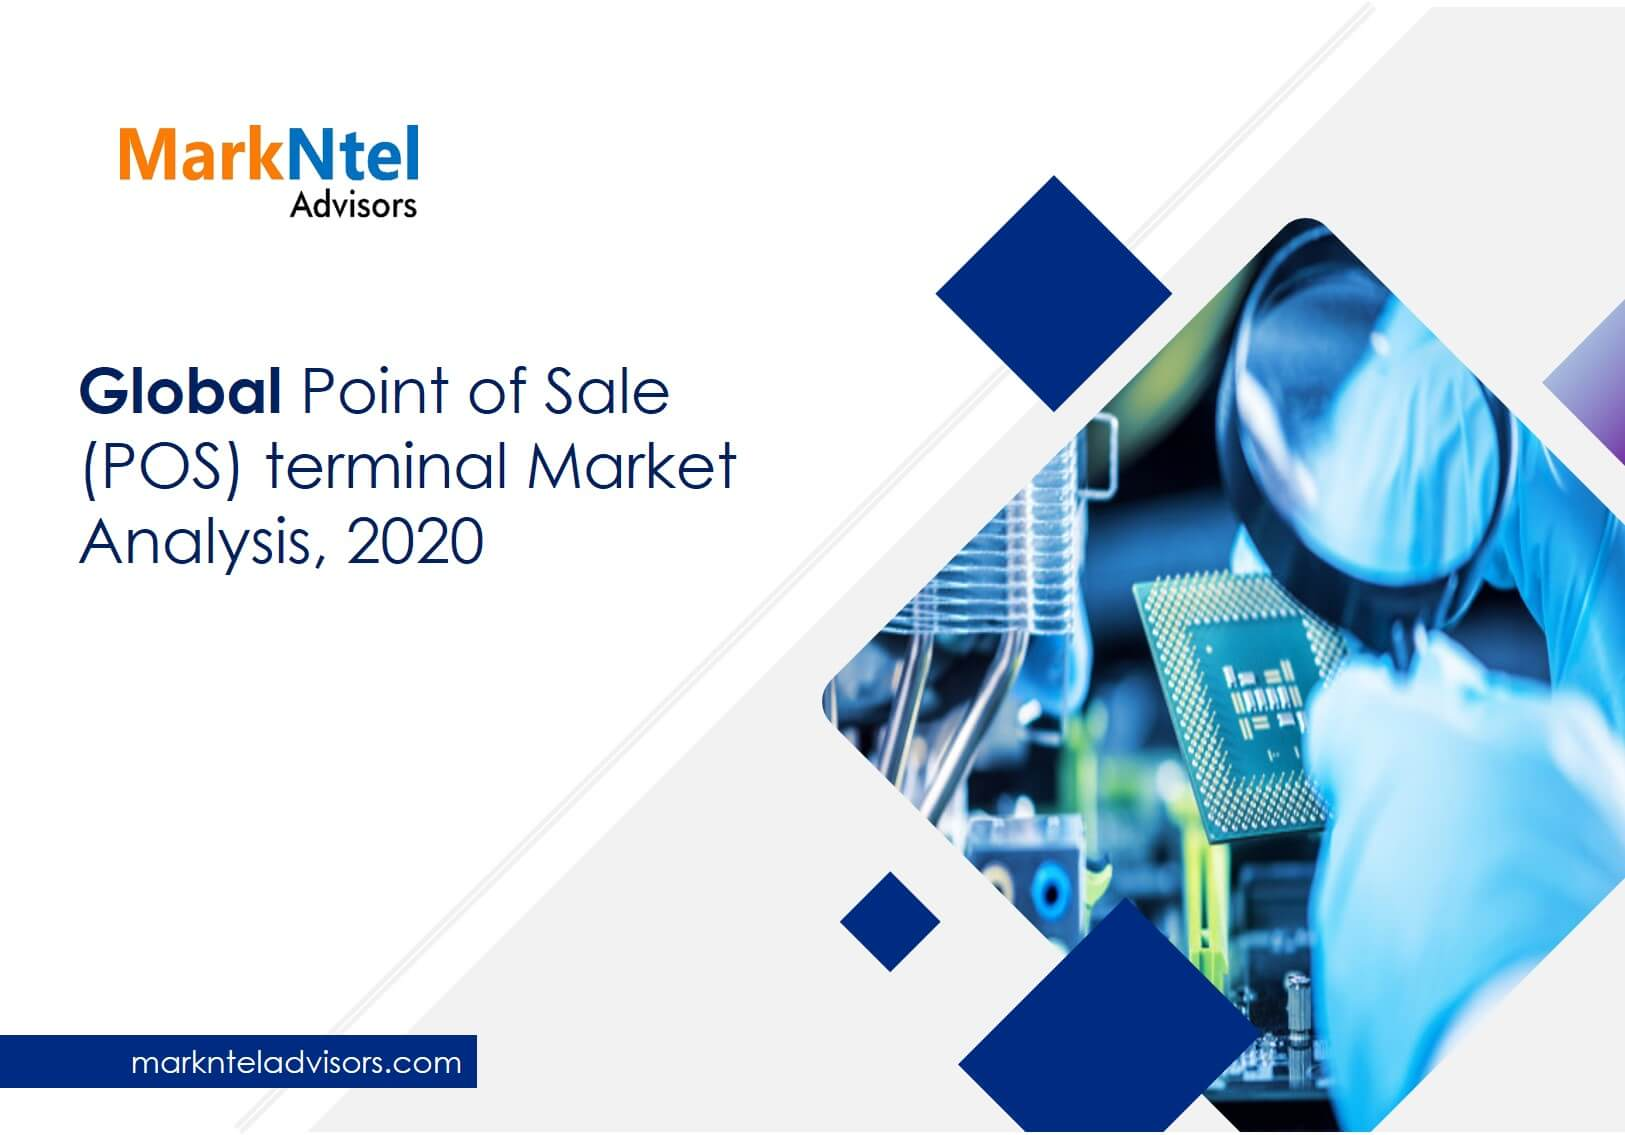 Global Point of Sales (POS) Terminal Market Analysis, 2020